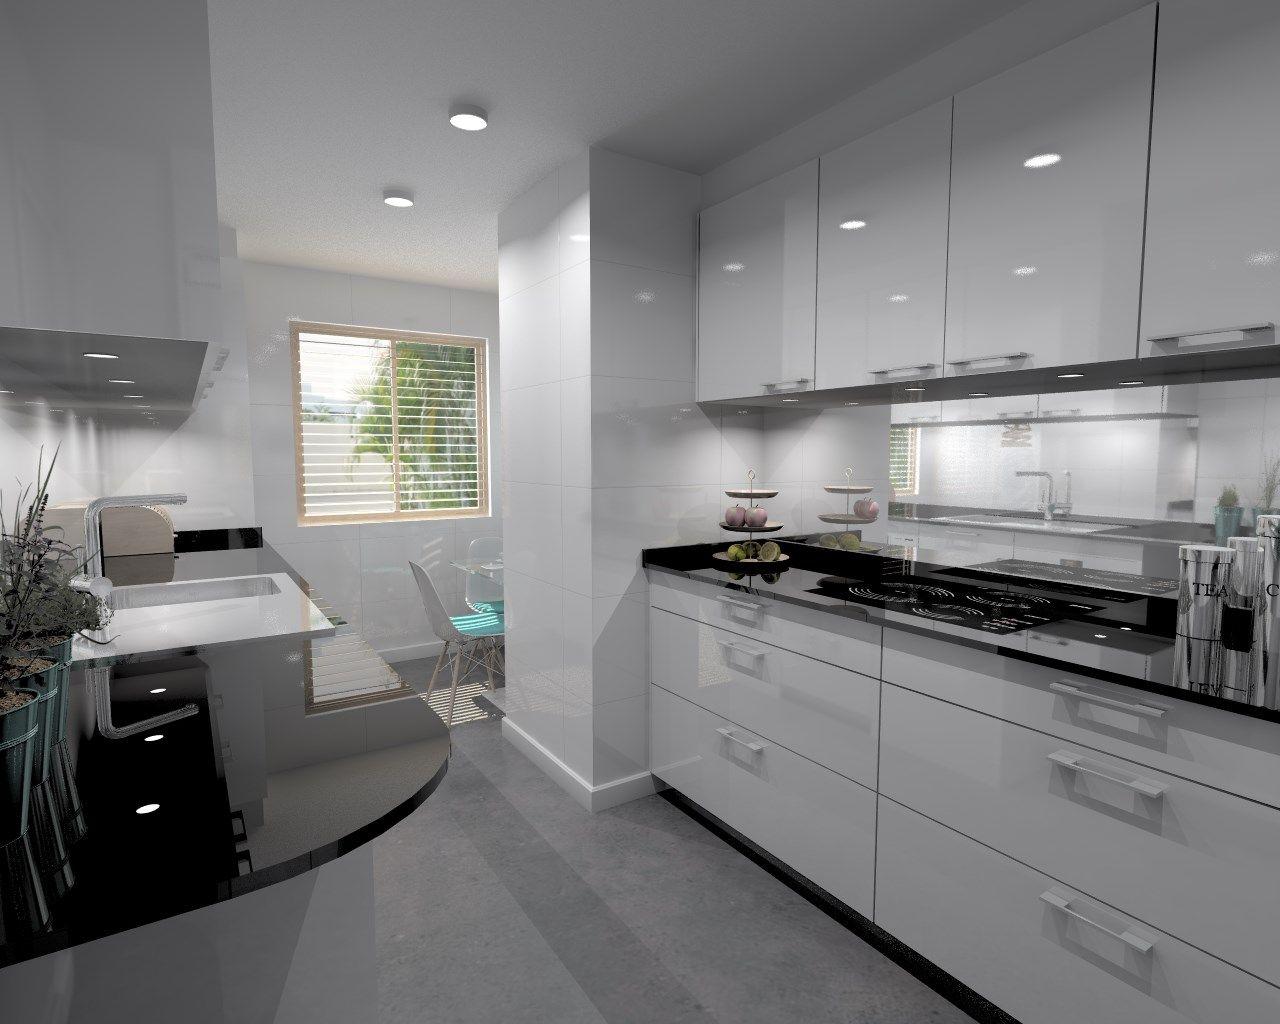 Cocina santos modelo plano laminado blanco brillo con for Cocinas de granito